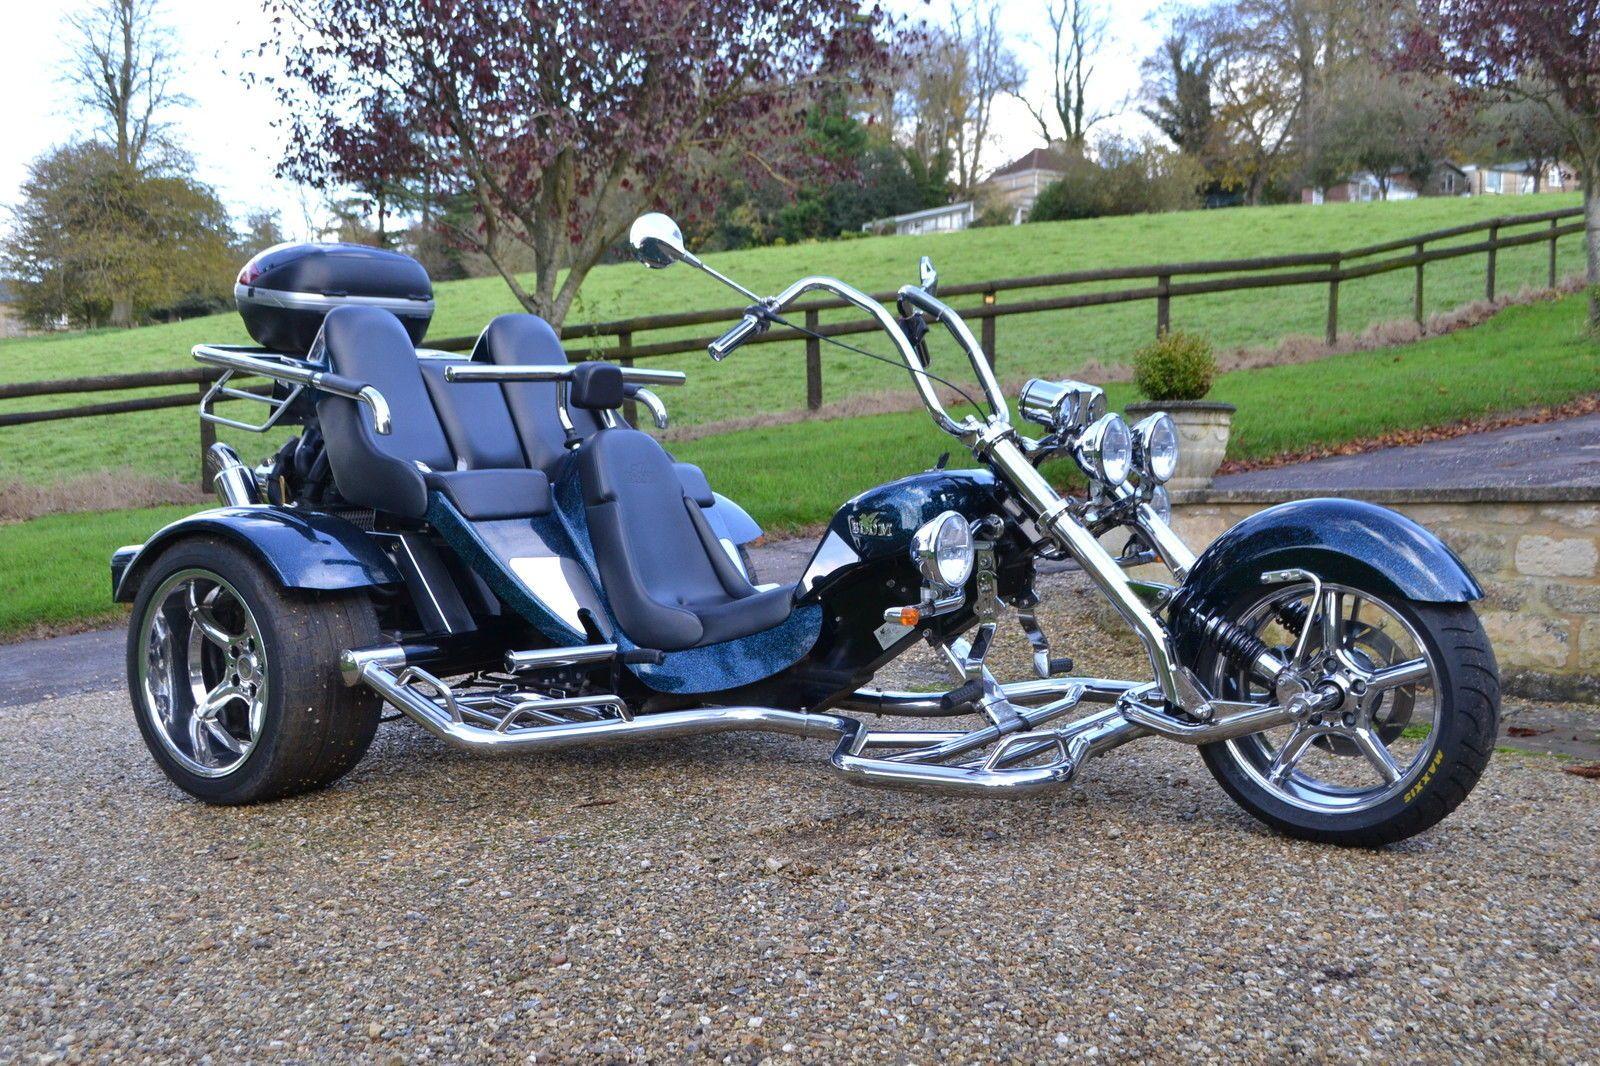 Boom Family Trike 6i With Duratec 1600 Trike Motorcycle Trike Vw Trike